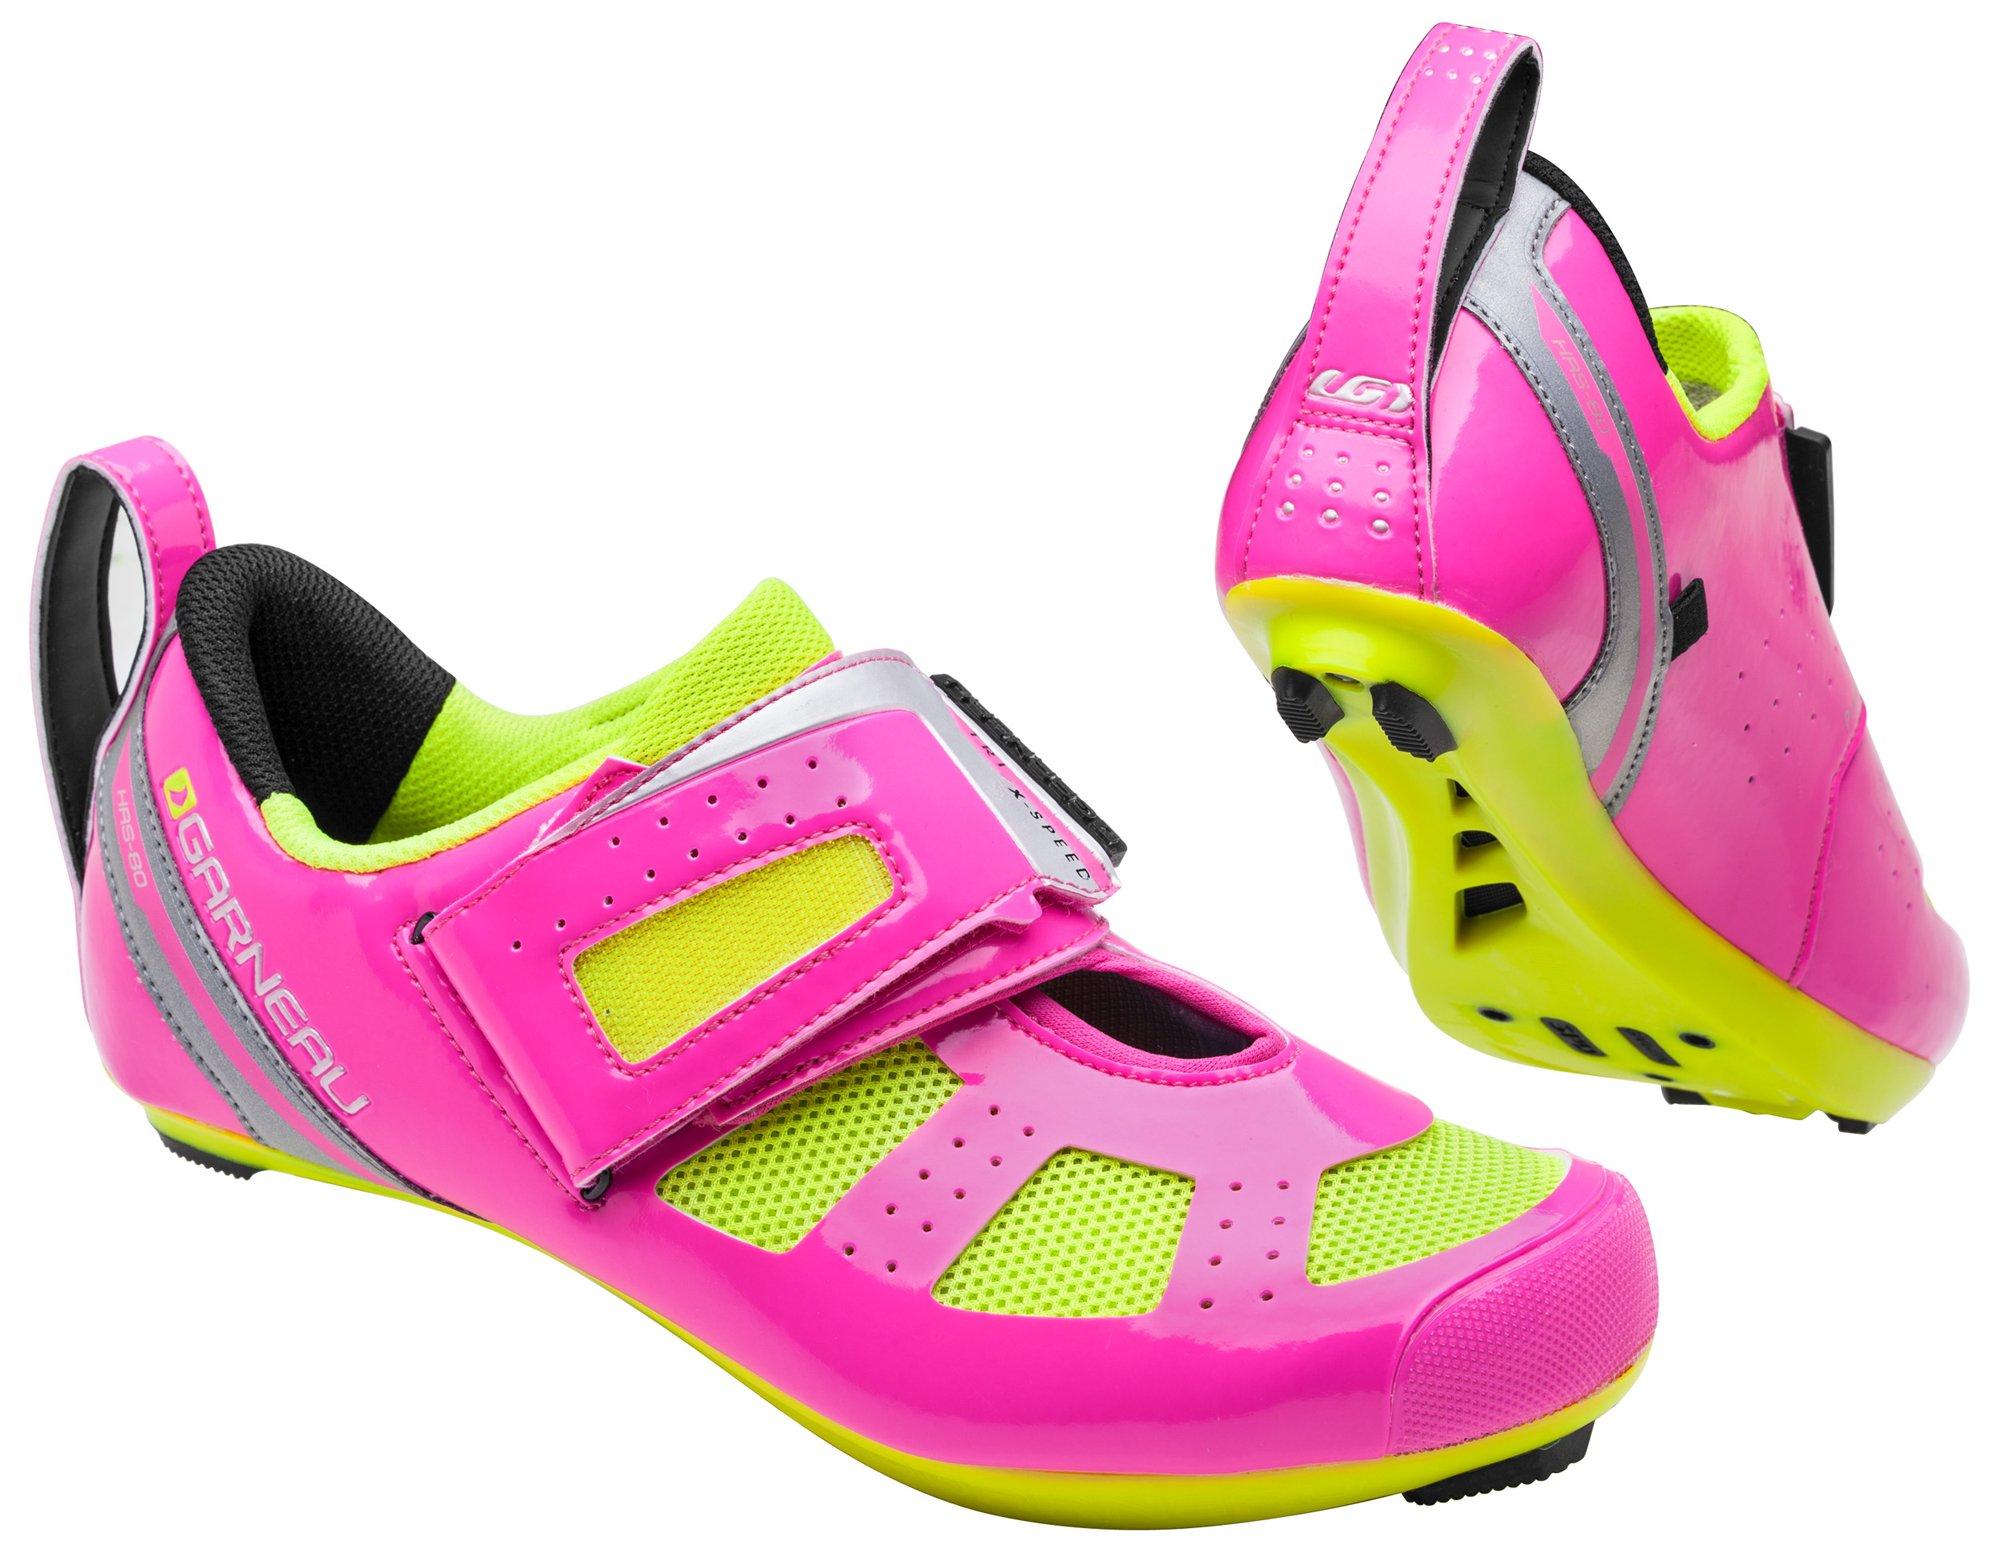 Louis Garneau - Women's Tri X-Speed 3 Triathlon Bike Shoes, Pink Glow/Bright Yellow, 41